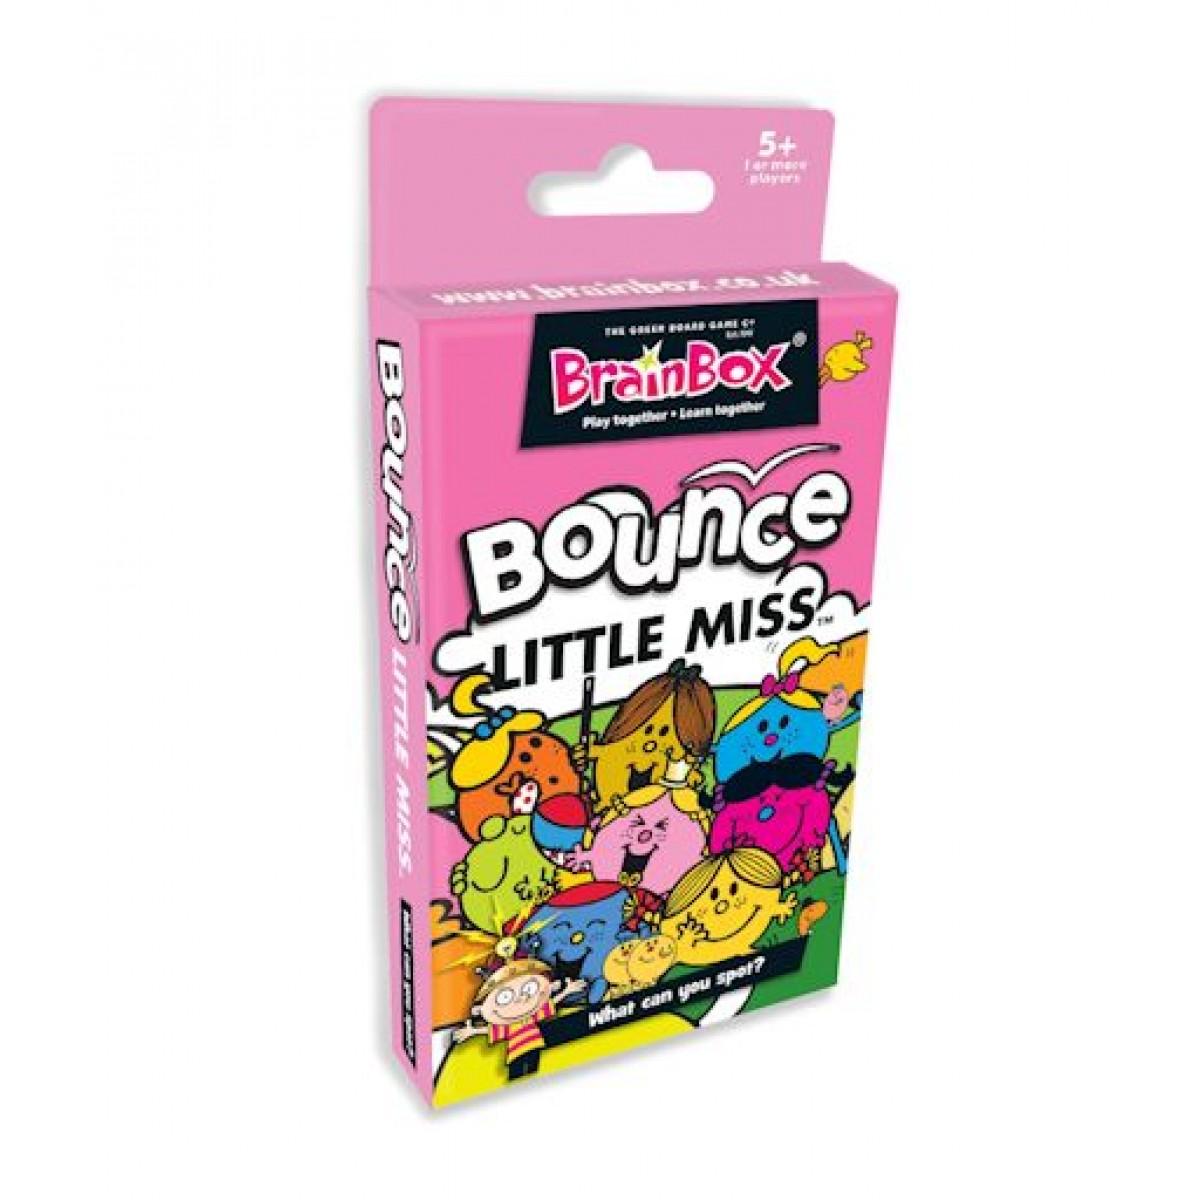 Bounce Little Miss